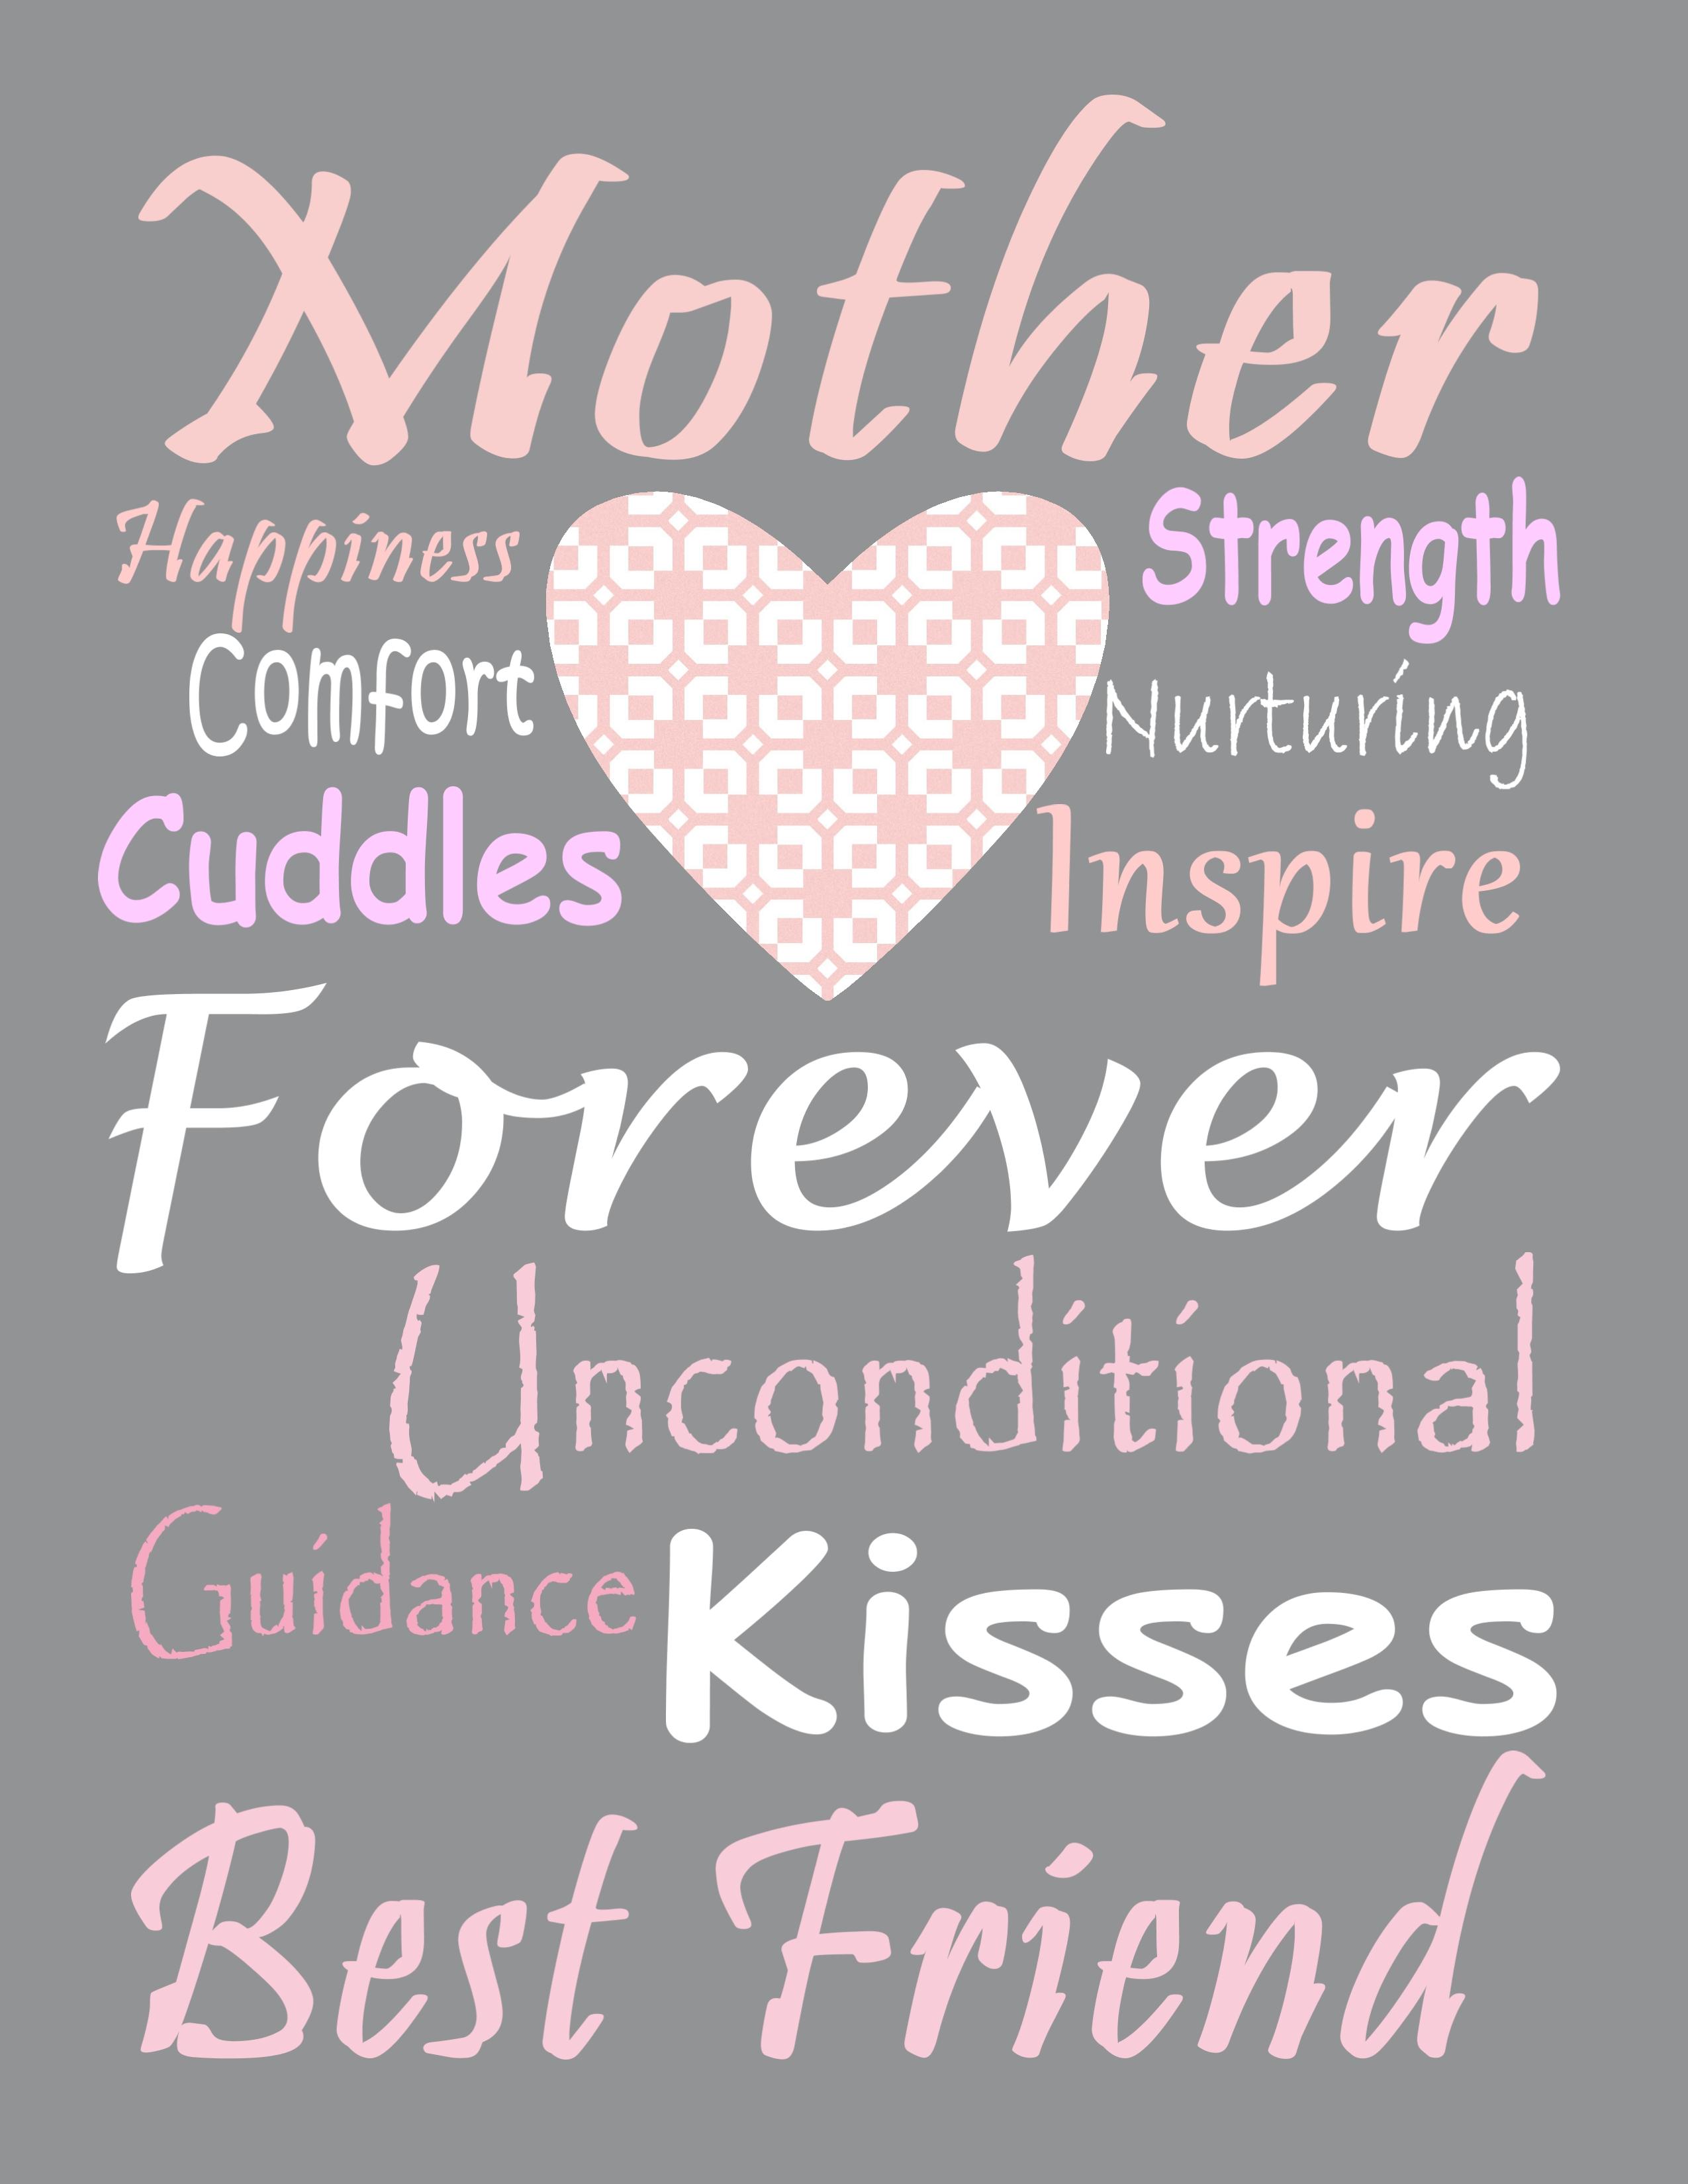 MothersDaySubway-001